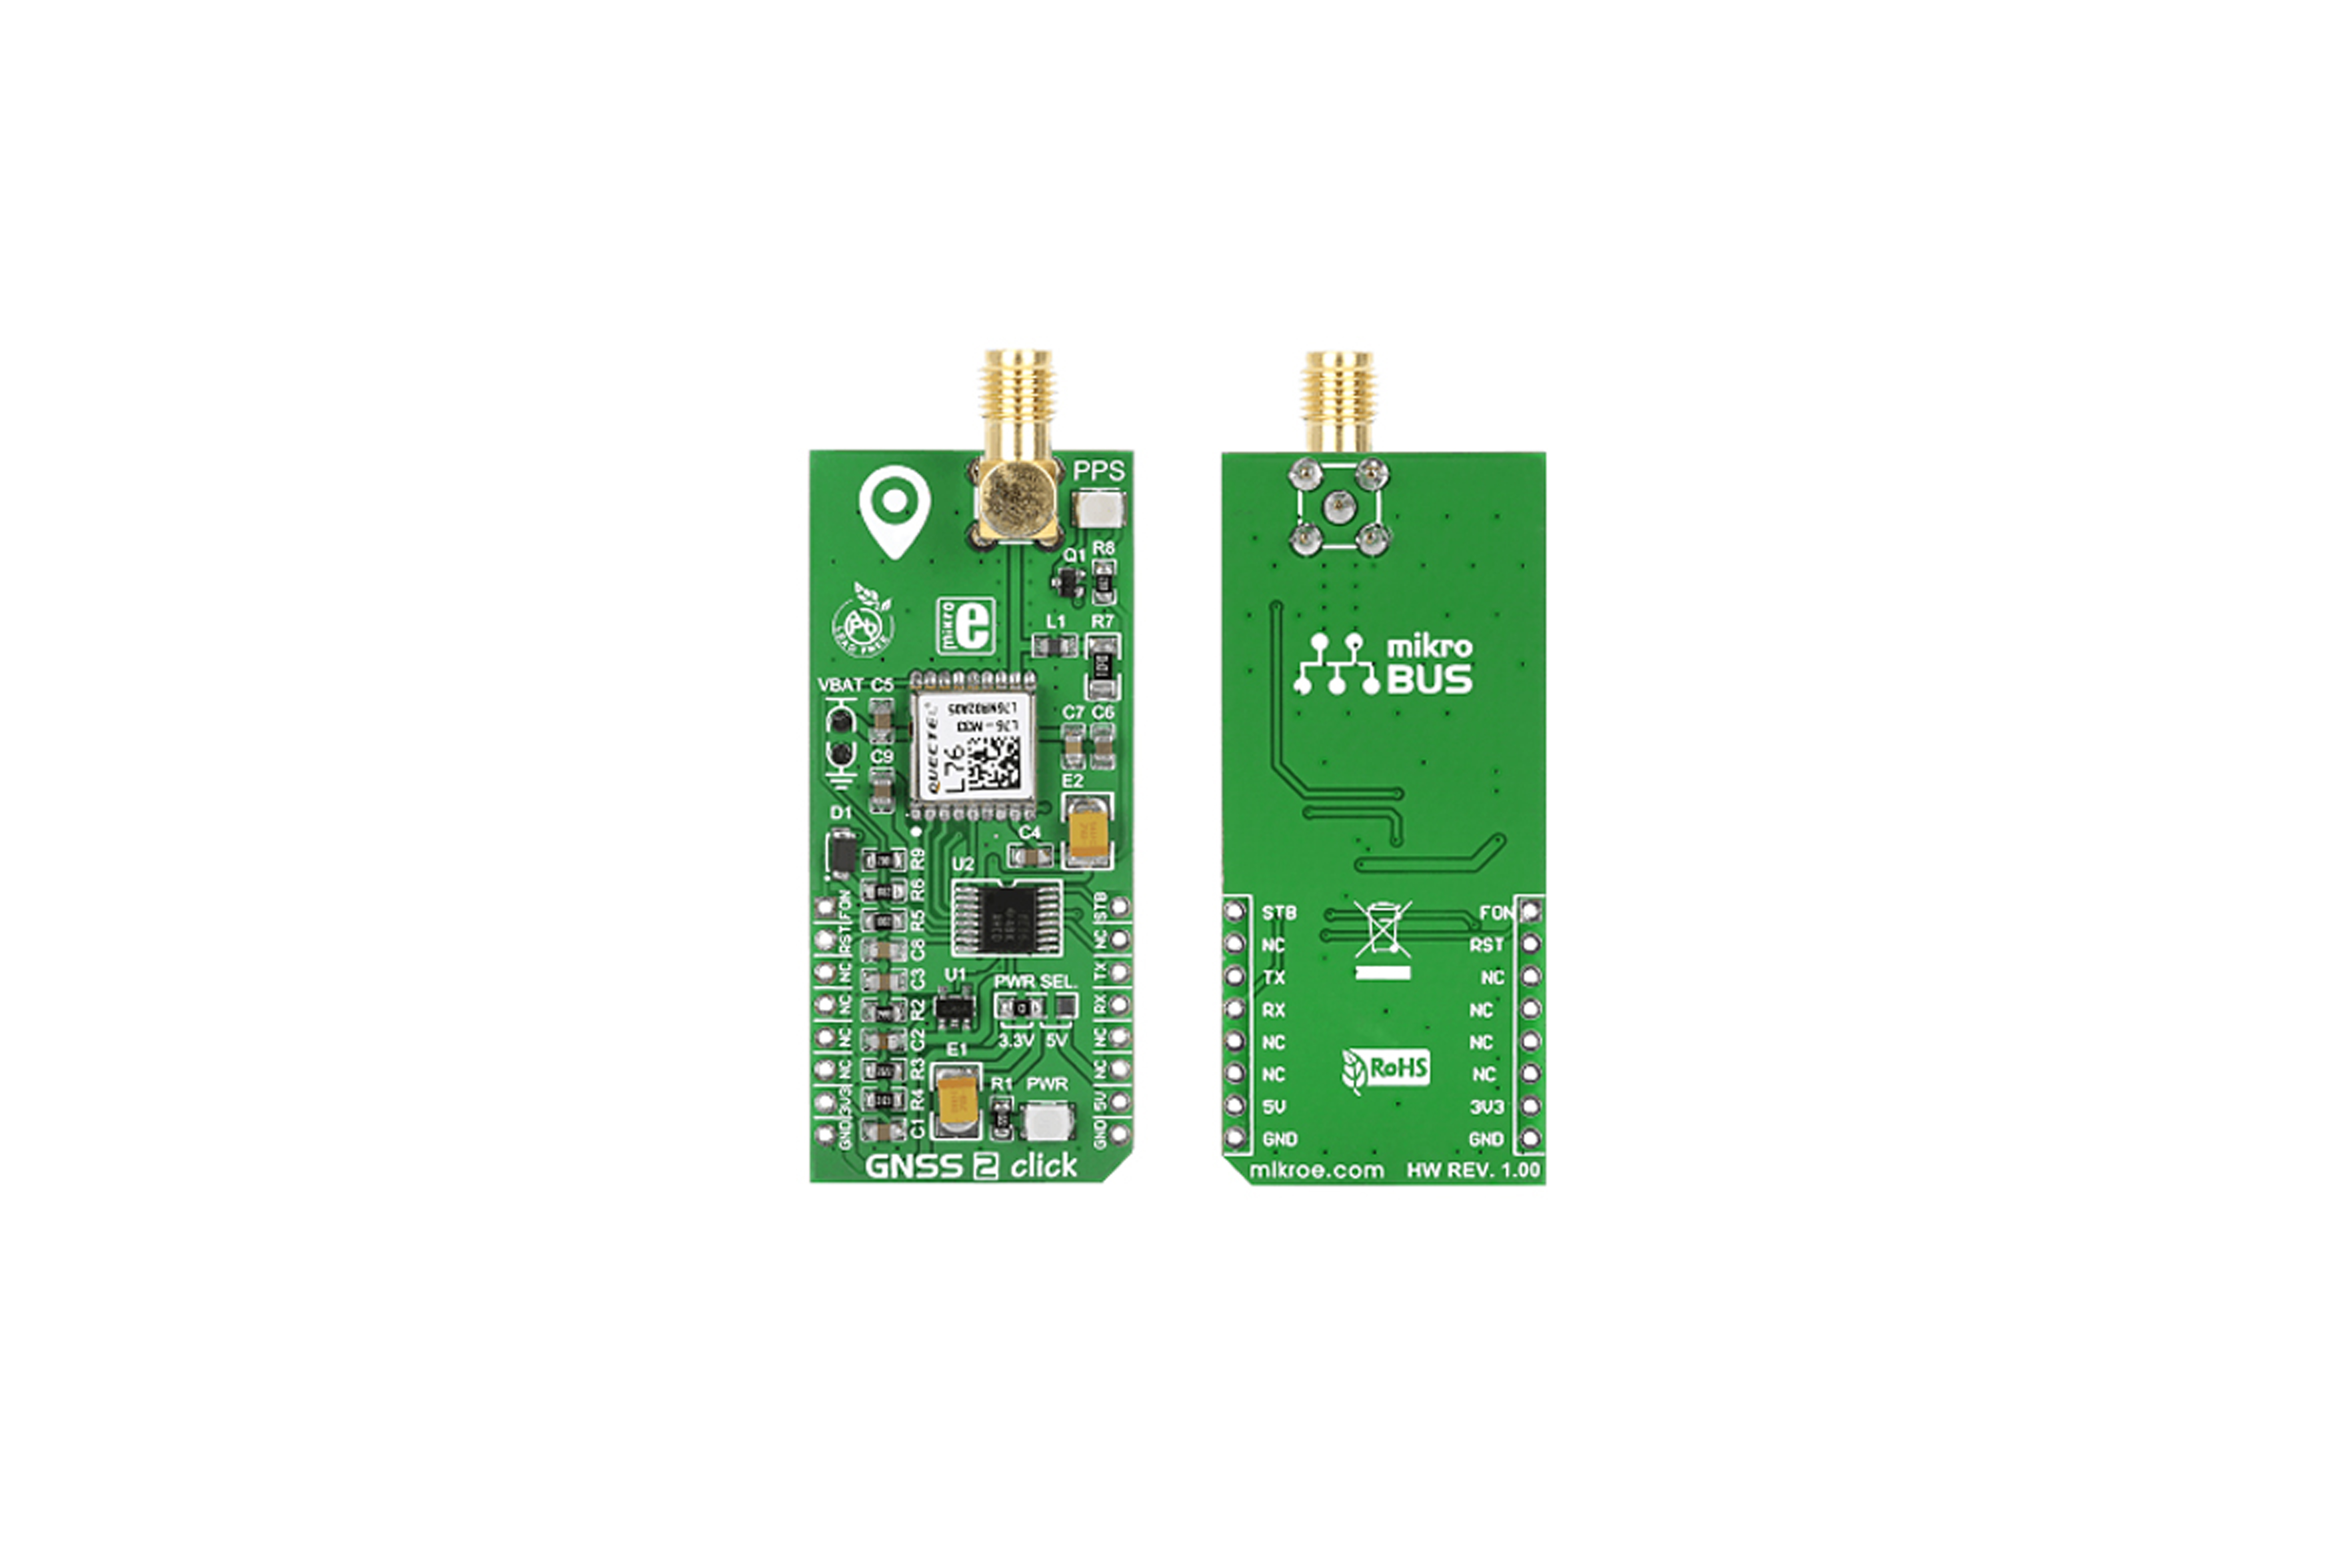 Carte à clic MikroBus GPS MikroElektronika GNSS2 pour L76